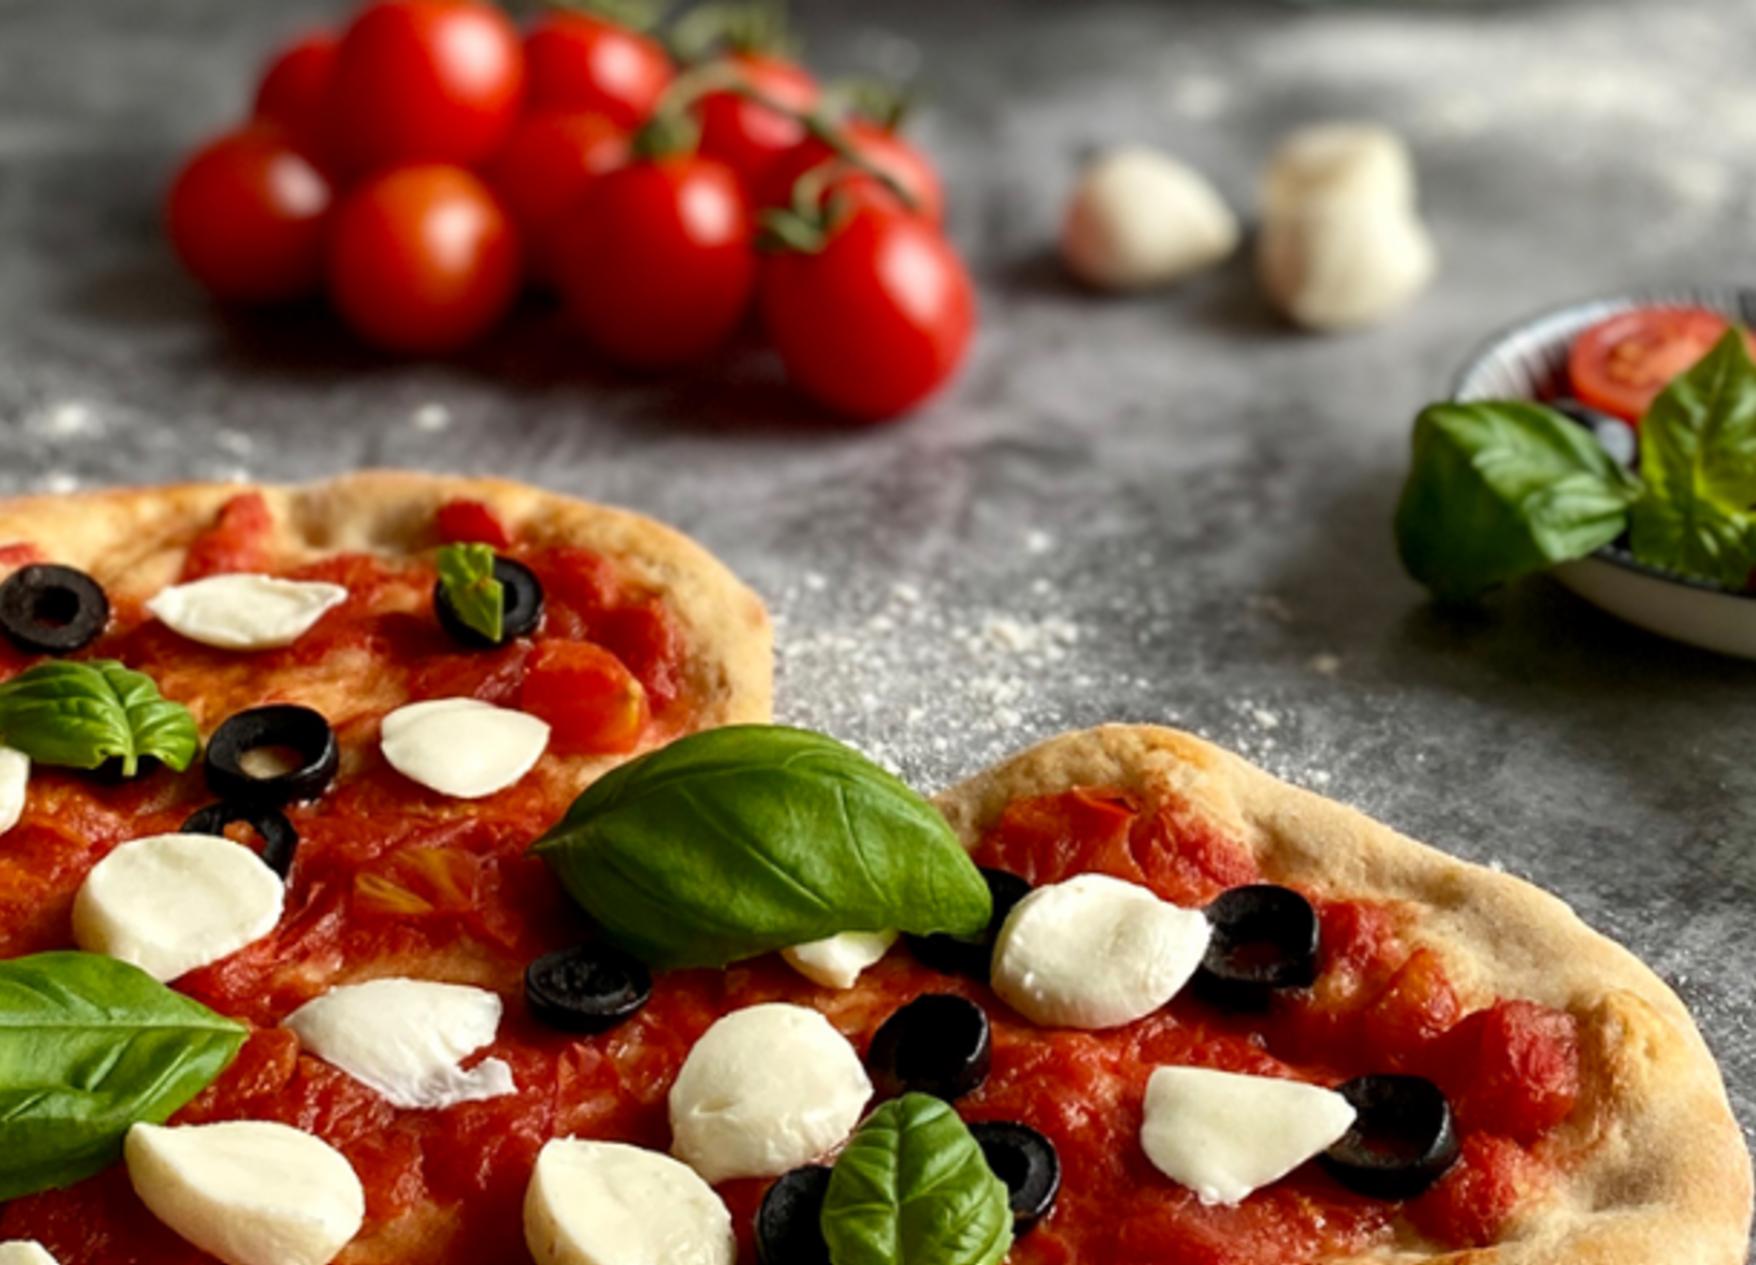 Picture emmer pizza with tomatoe and mozzarella